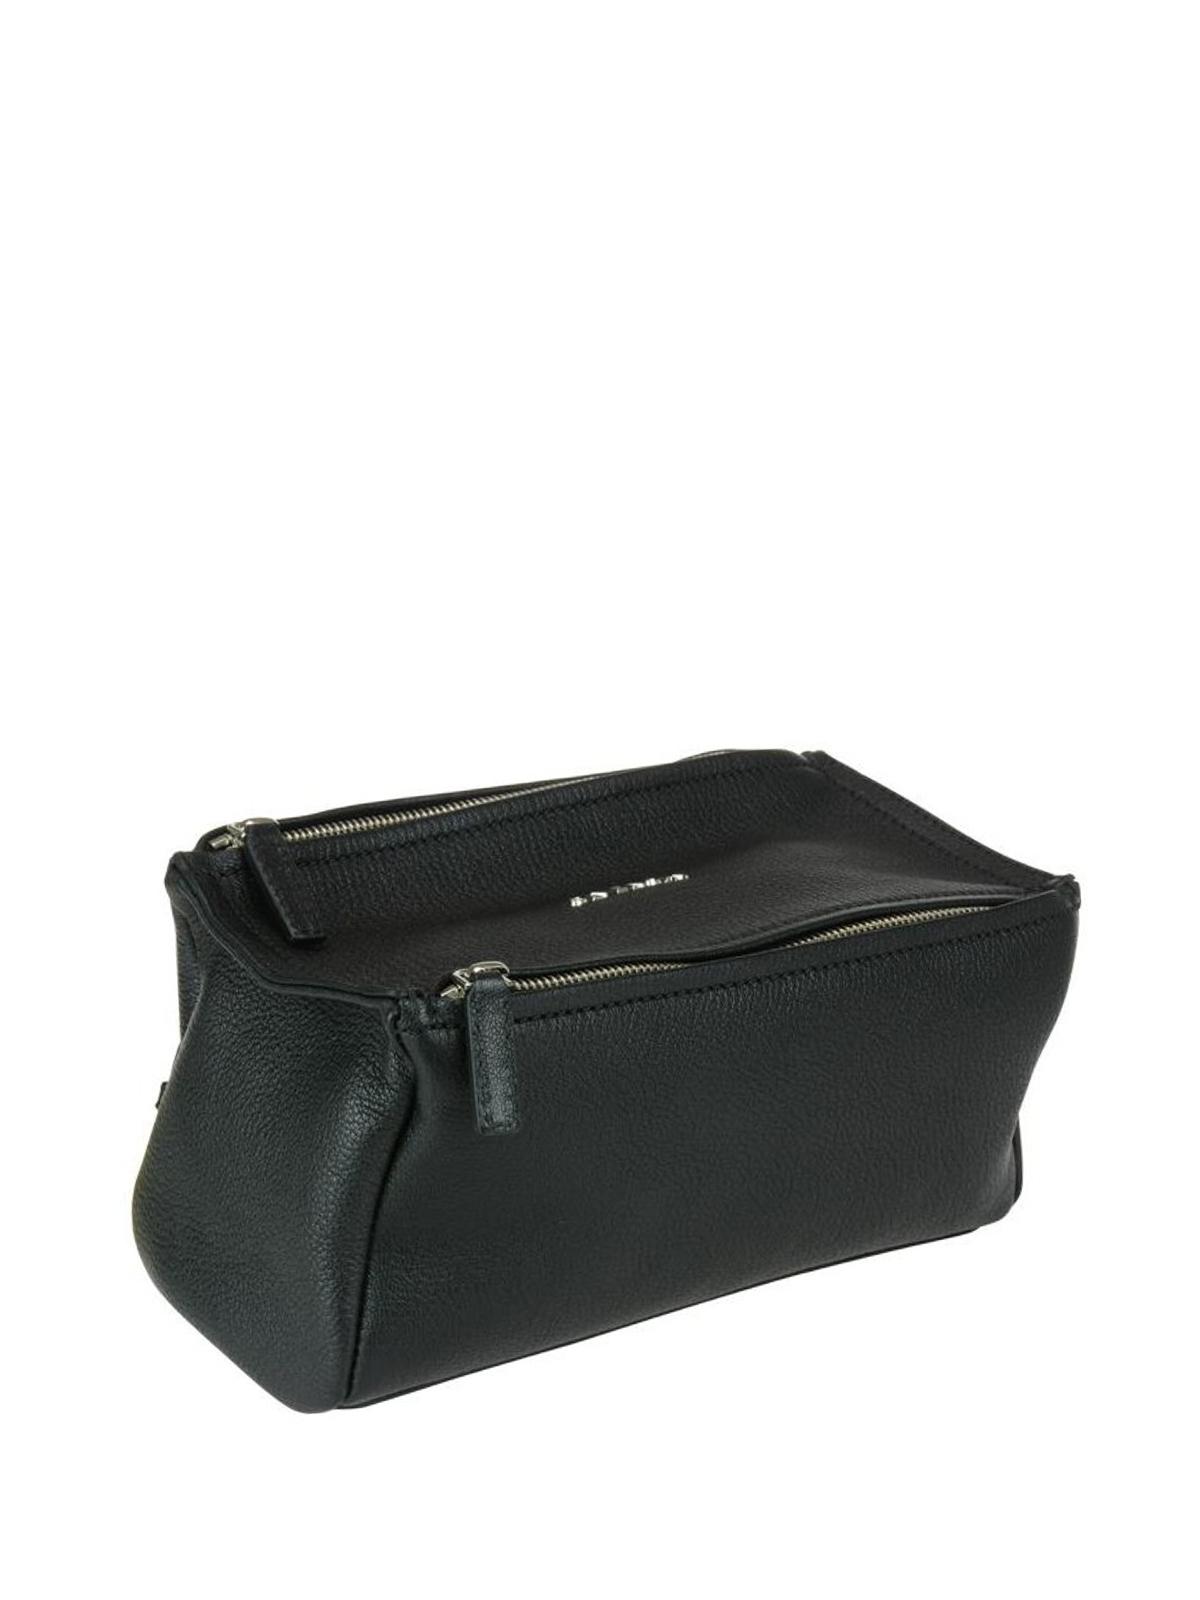 d4d9a6f01c63 GIVENCHY  cross body bags online - Pandora Mini black bowling bag